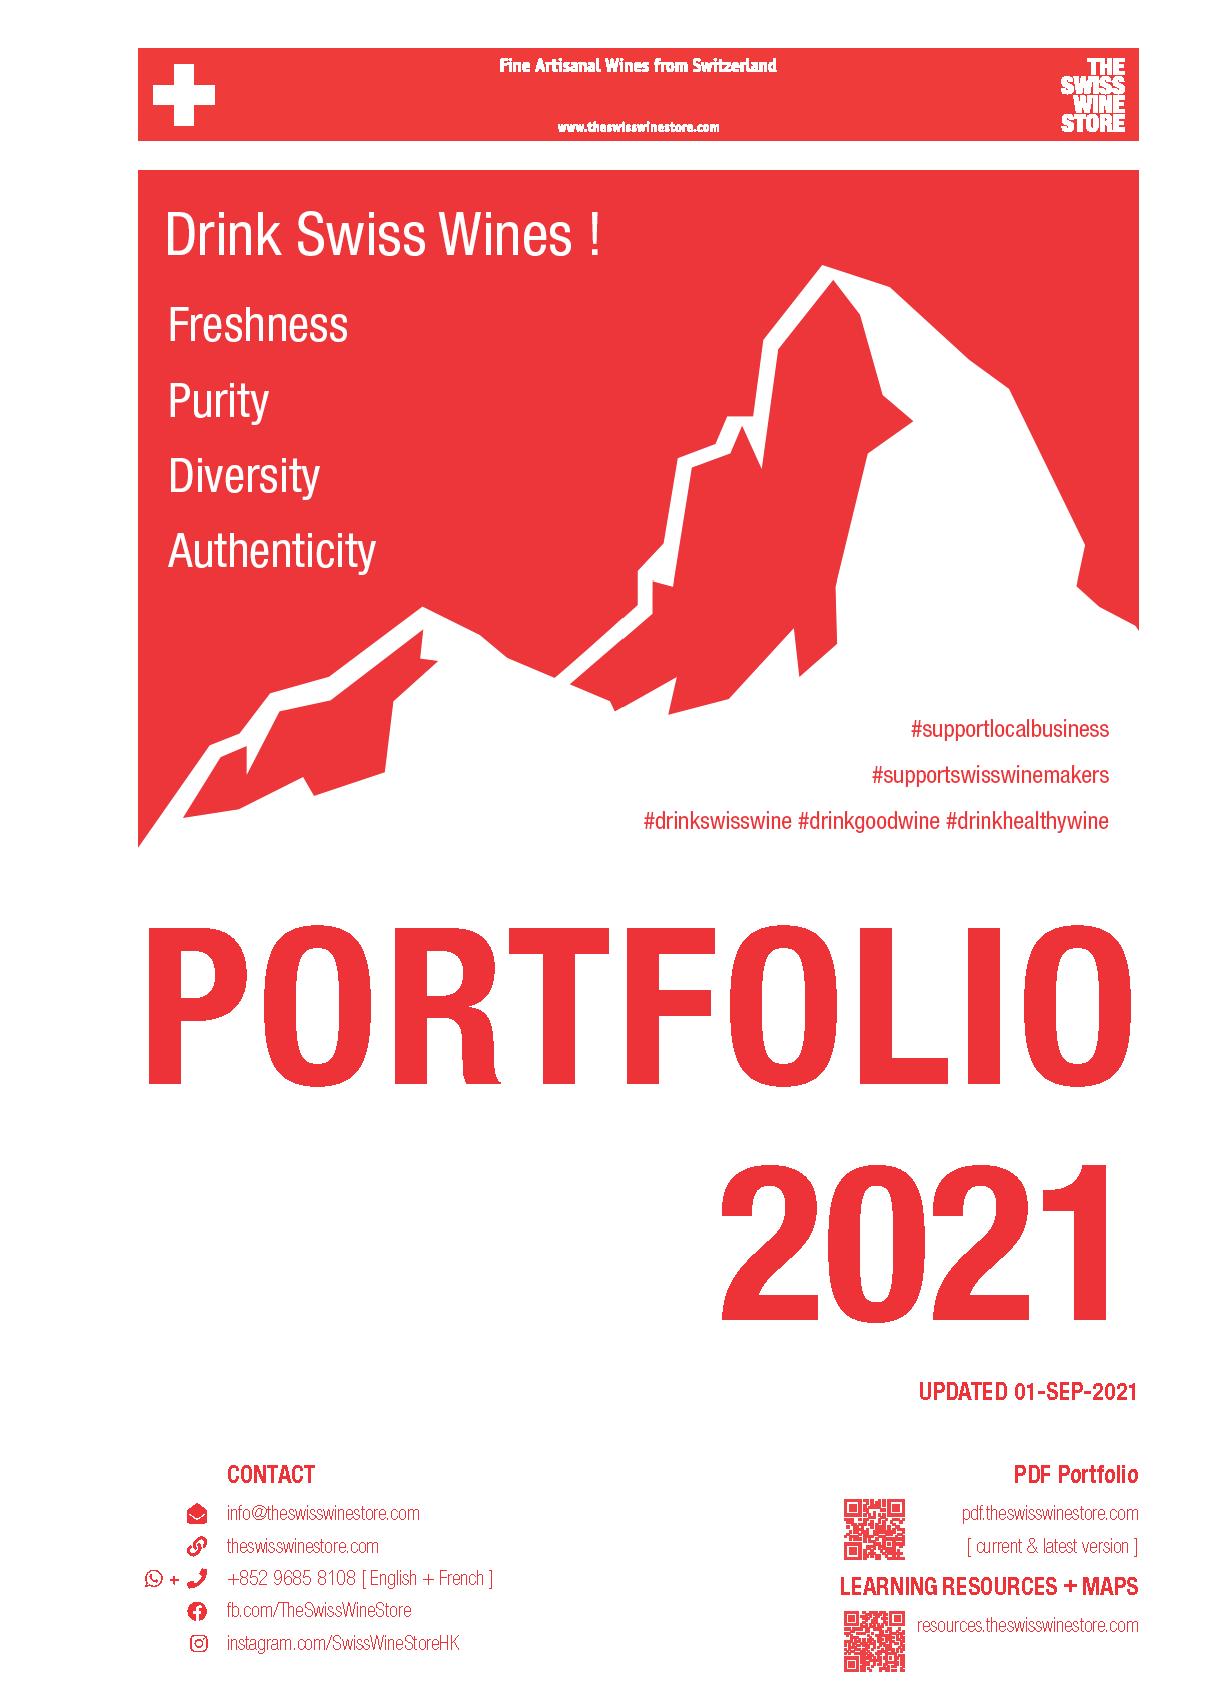 tsws_wine_portfolio_A4_2021-09.png